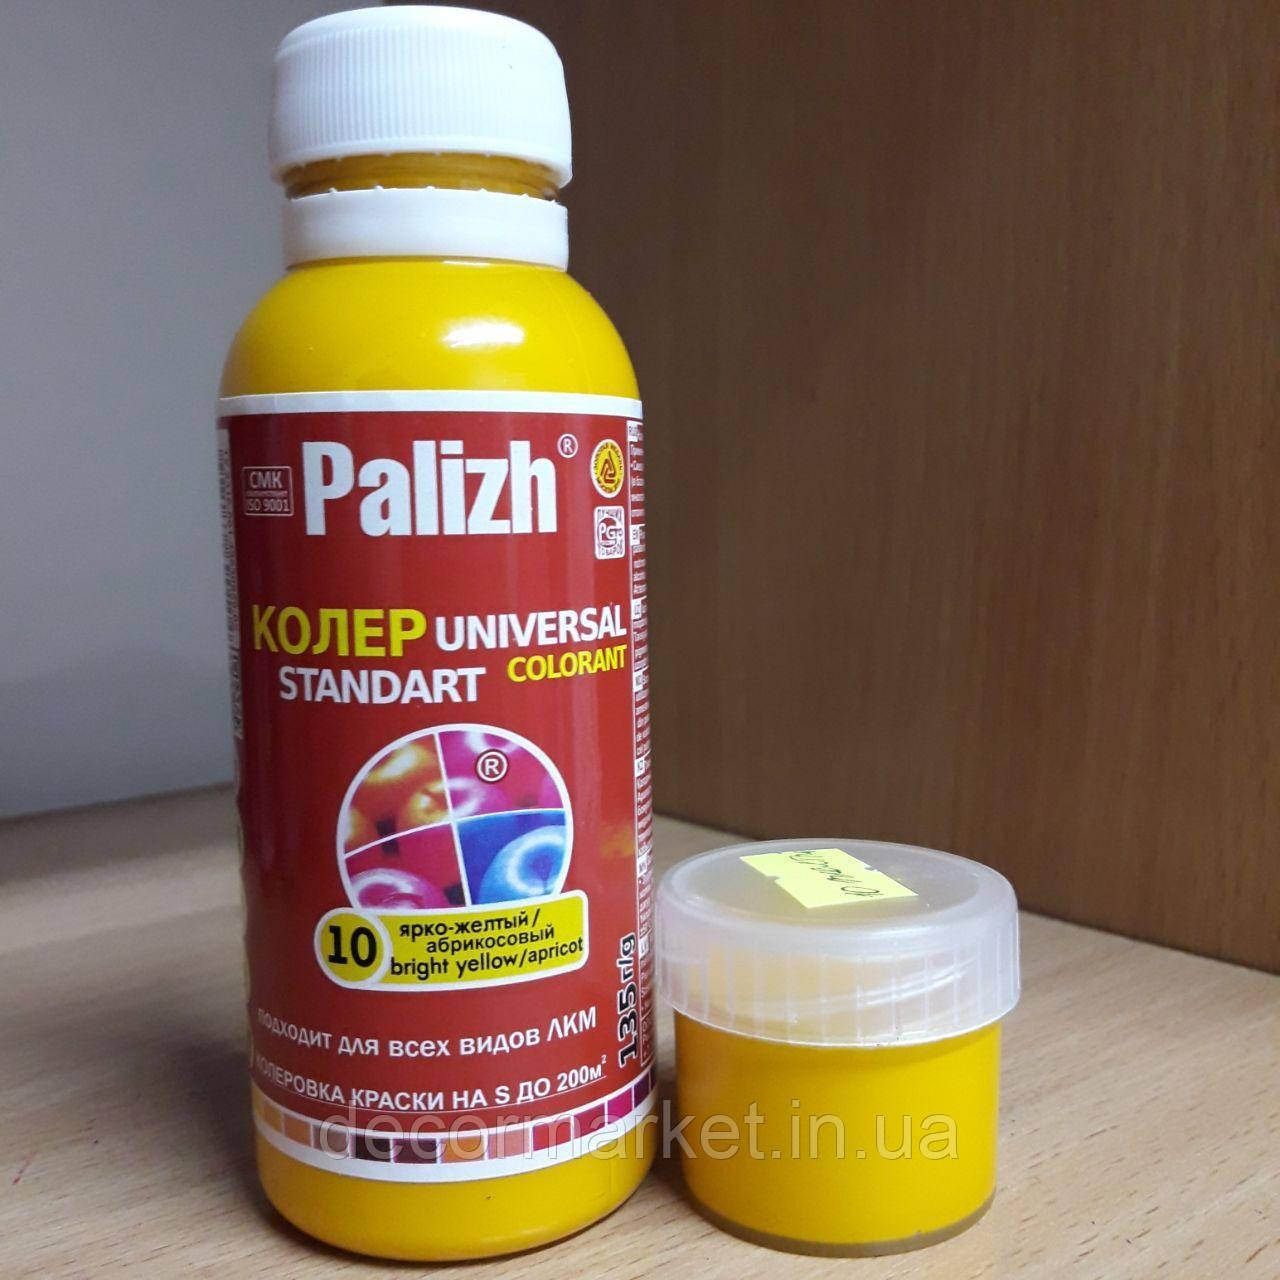 Колер PALIGH яскраво-жовтий 140мл